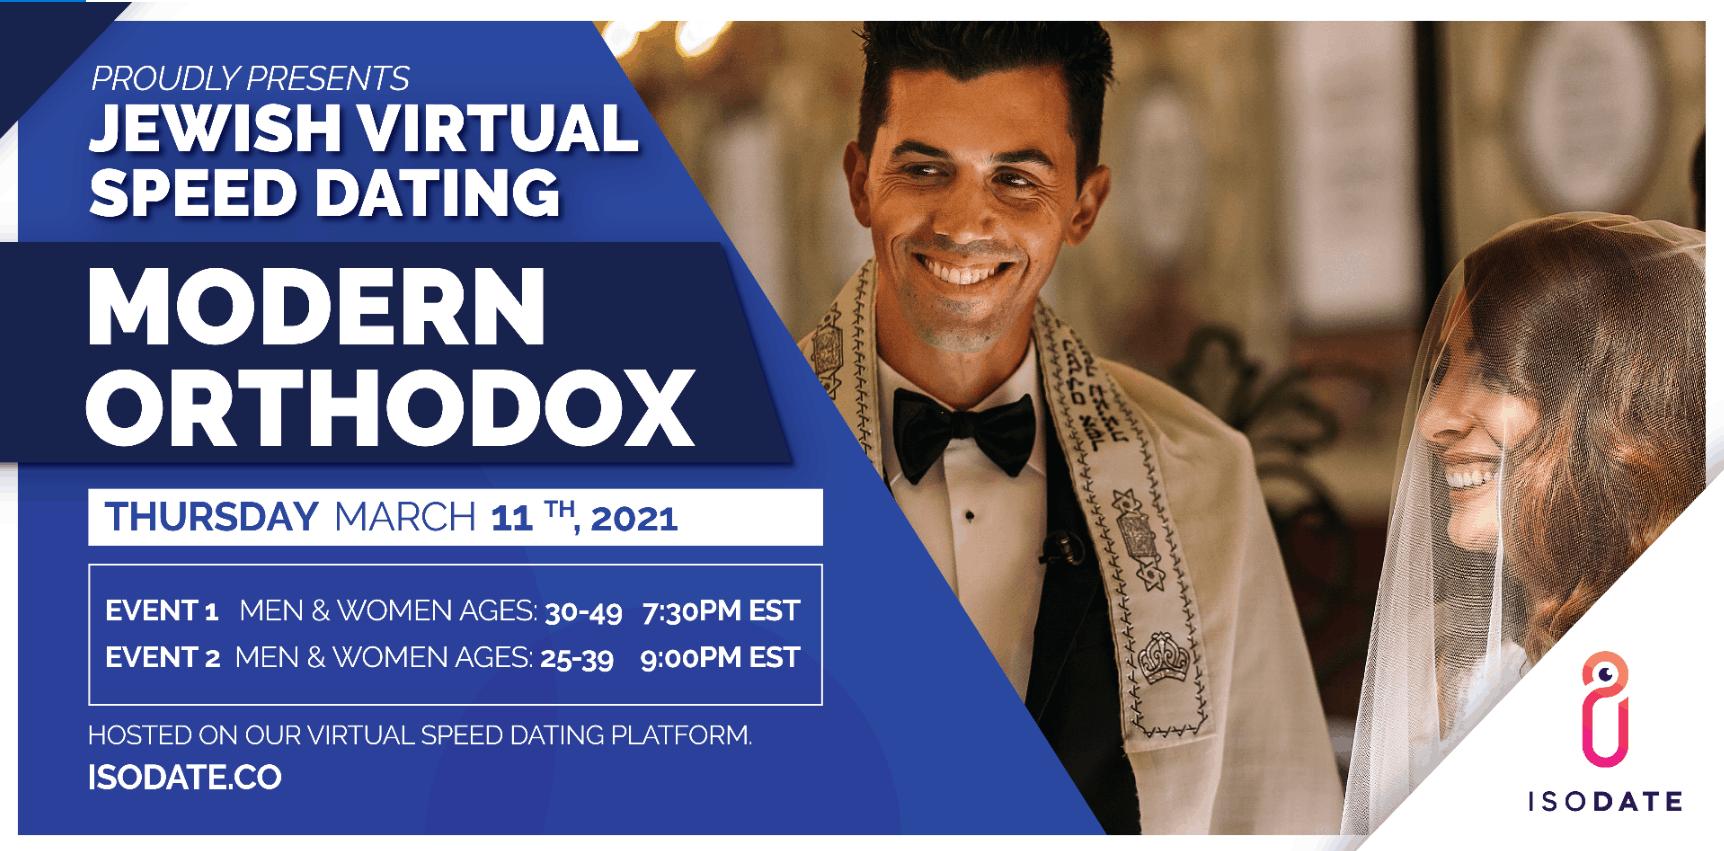 Isodate's Modern Orthodox Jewish Virtual Speed Dating